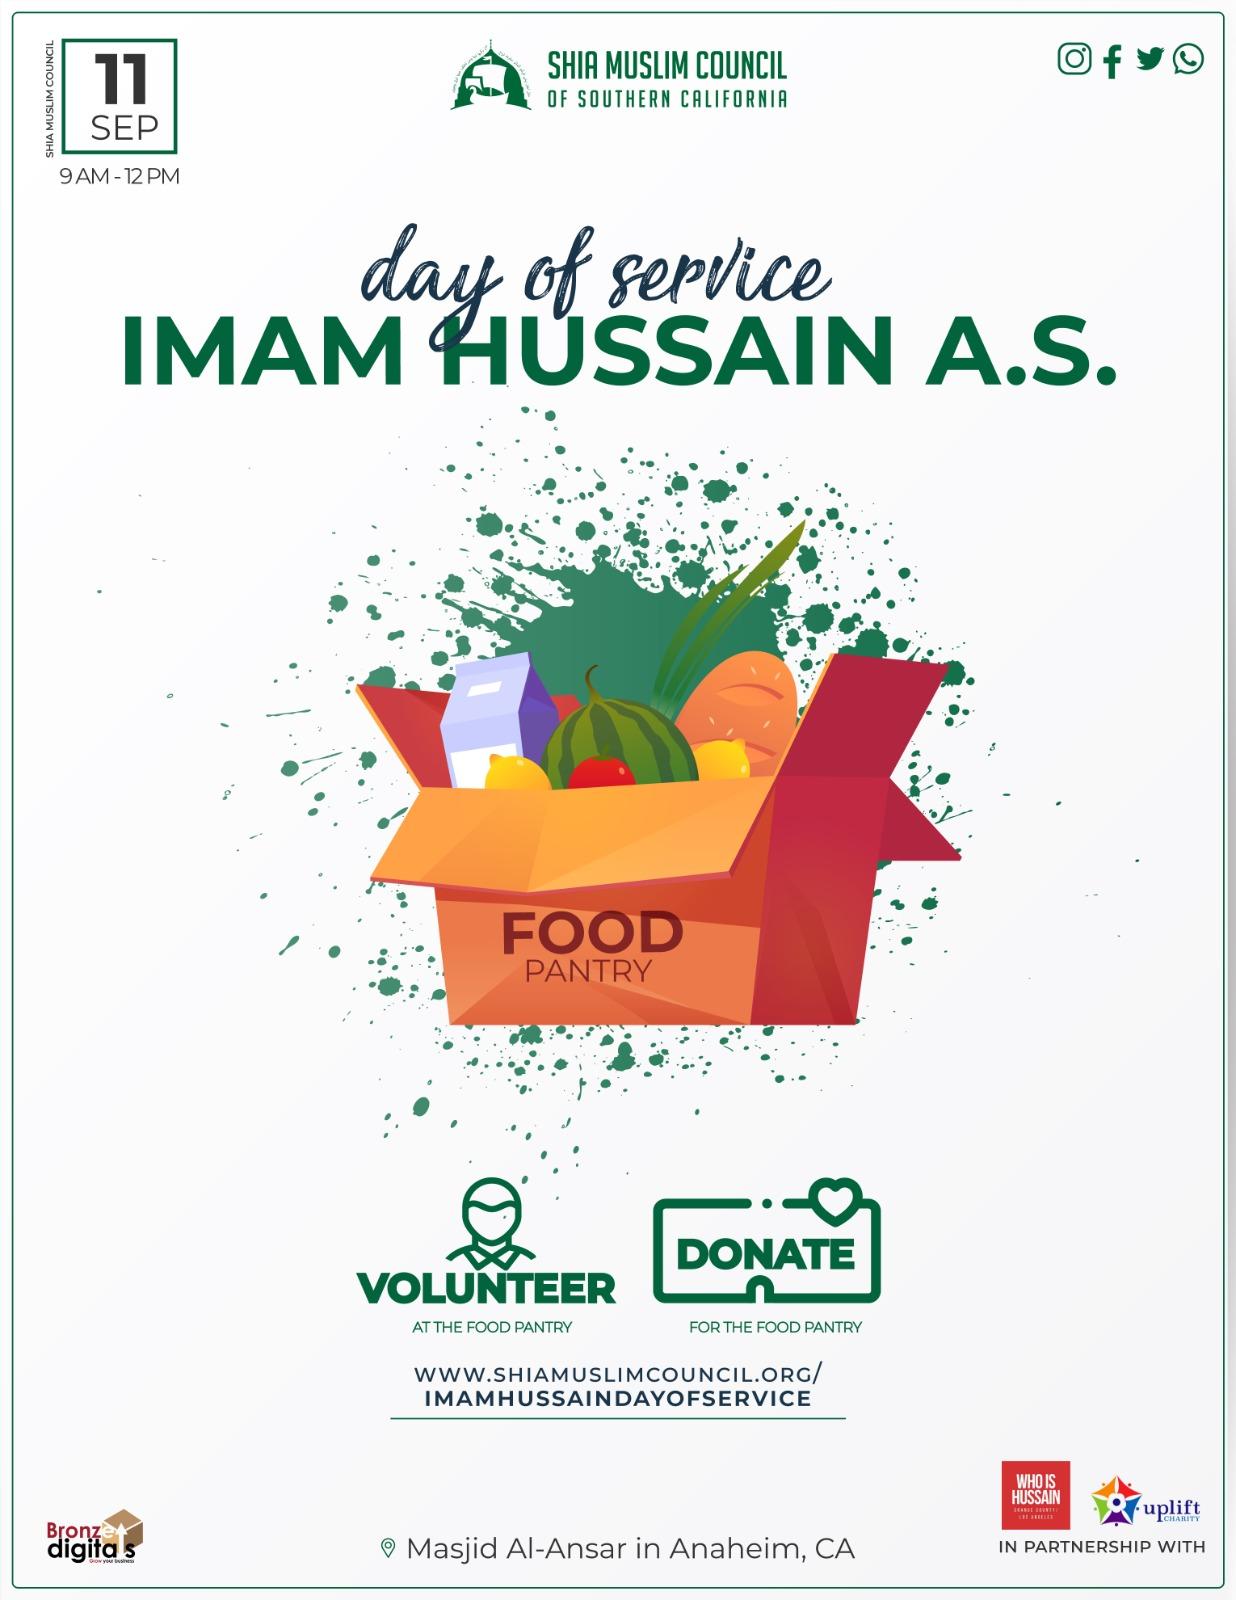 Imam Hussain Day of Service